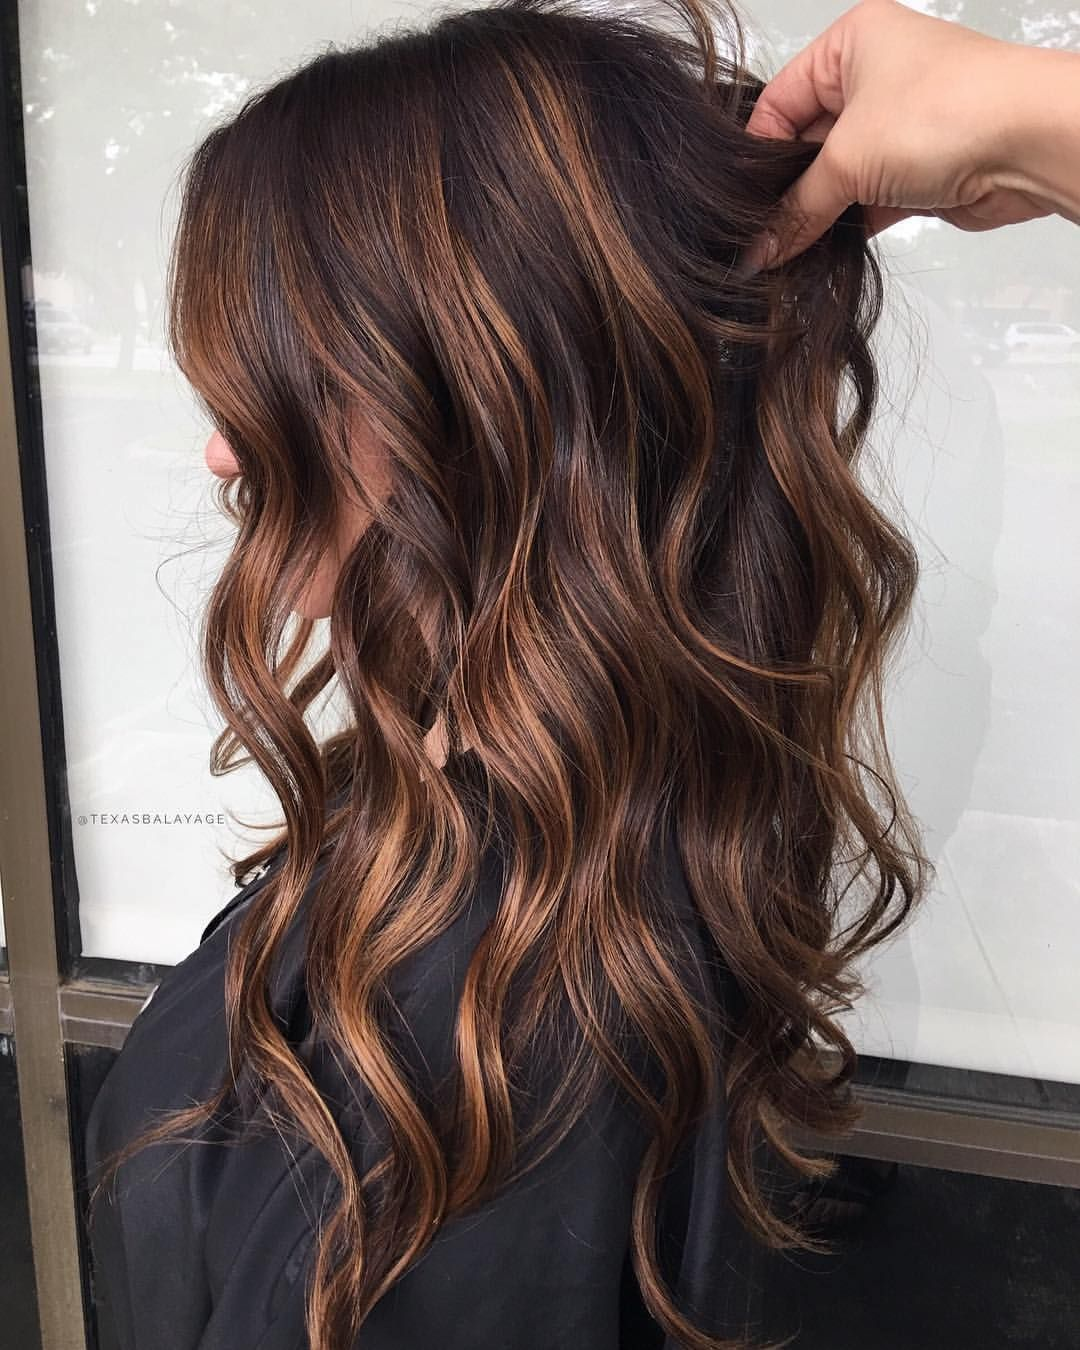 35 Caramel Hair Color Ideas Trends Highlights Styles And More Hair Color Caramel Hair Styles Long Hair Styles